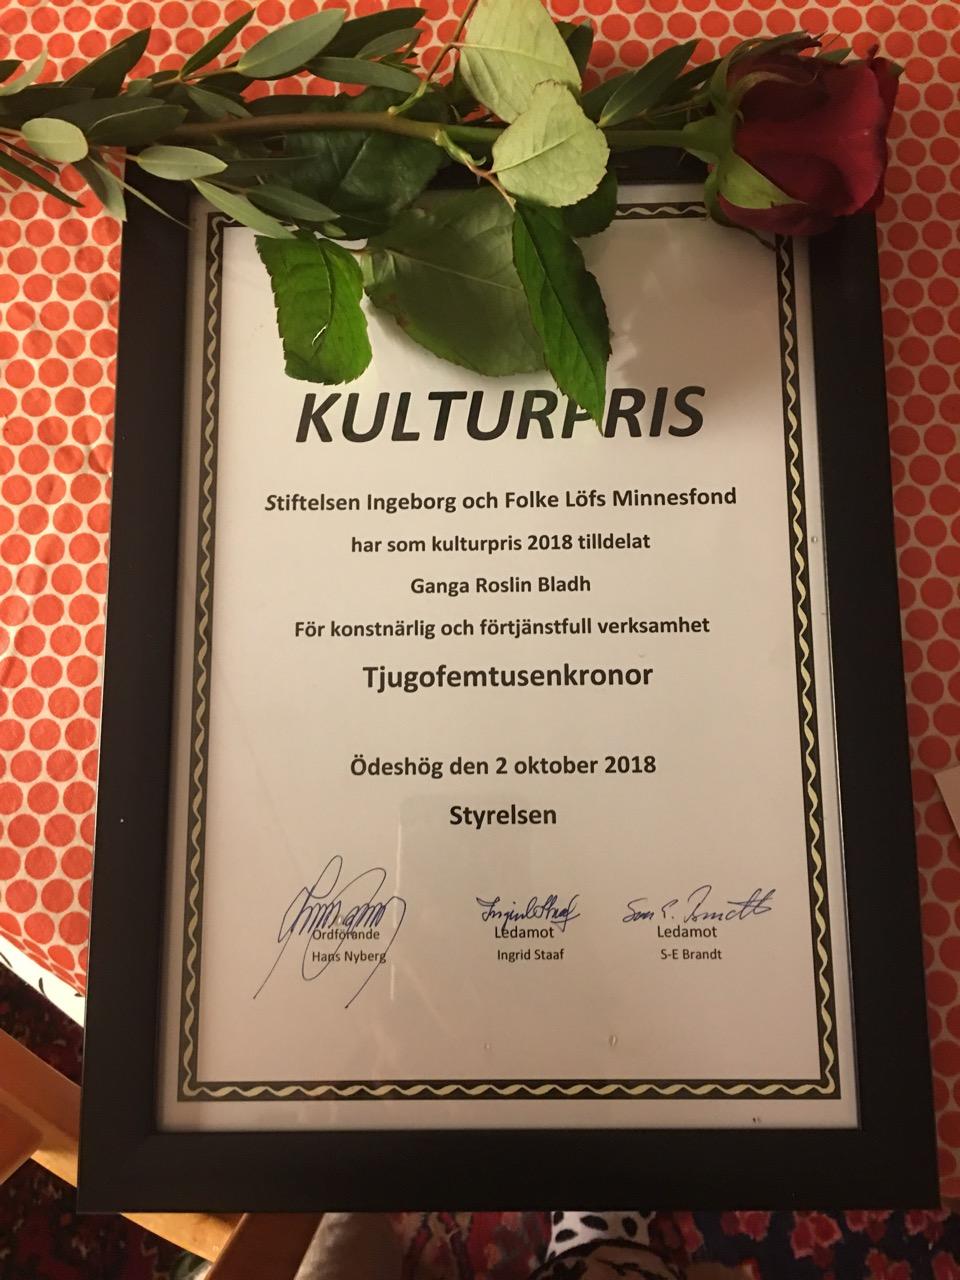 Kulturpris till Ganga Roslin Bladh, 2018, Löfs minnesfond